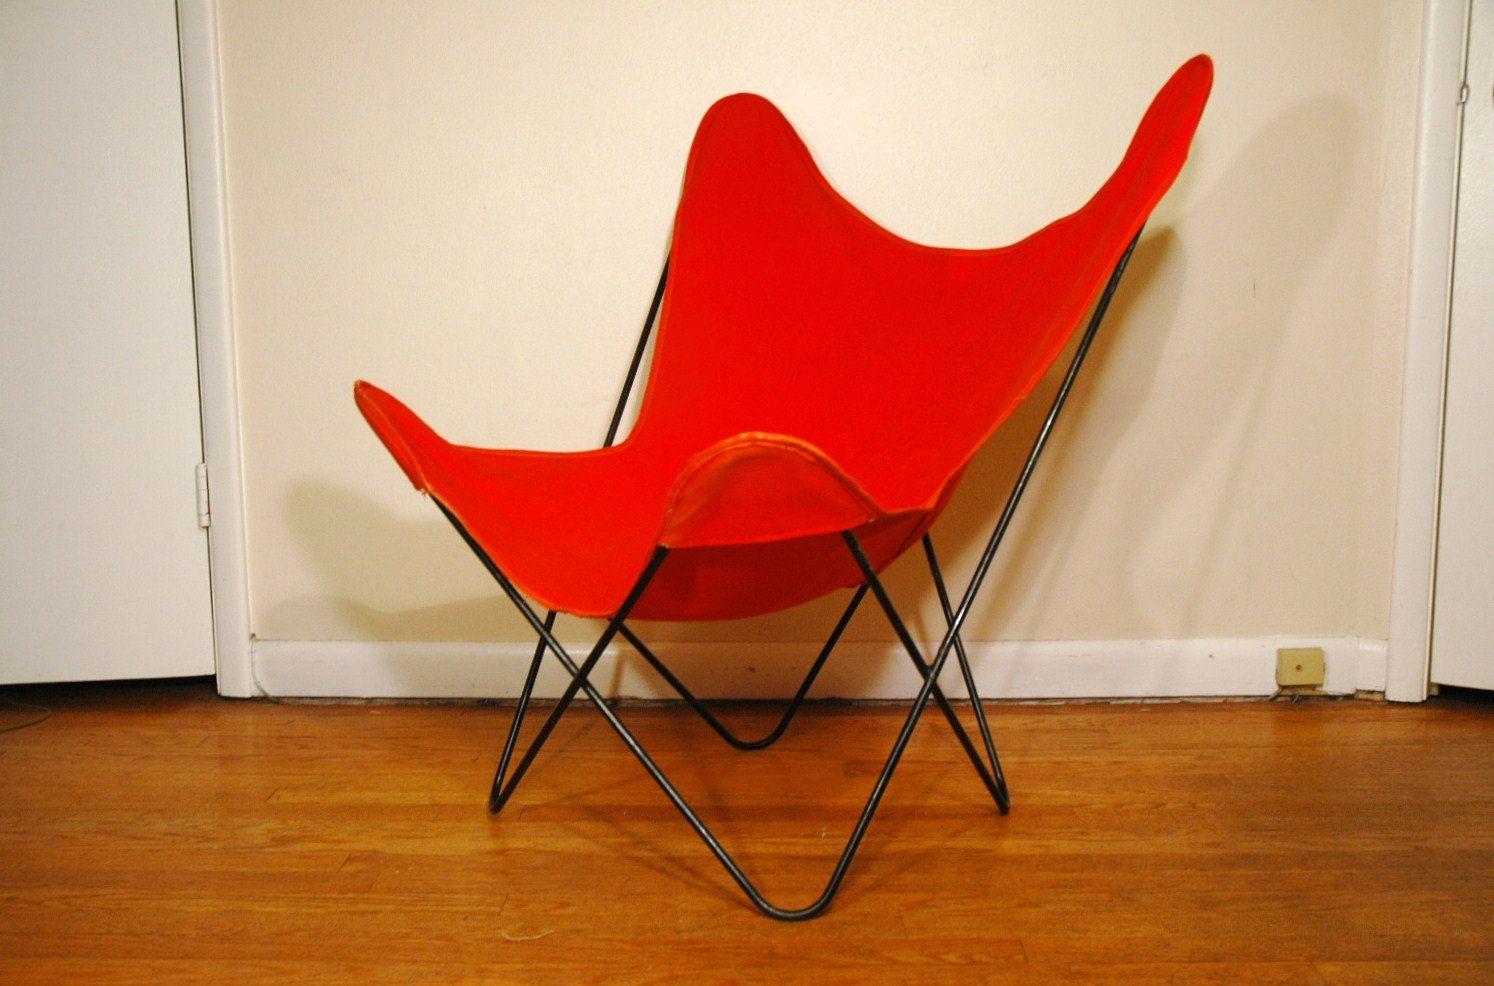 Knoll Hardoy Butterfly Chair   Mid Century Modern Orange B.K.F. Chair.  $225.00, Via Etsy